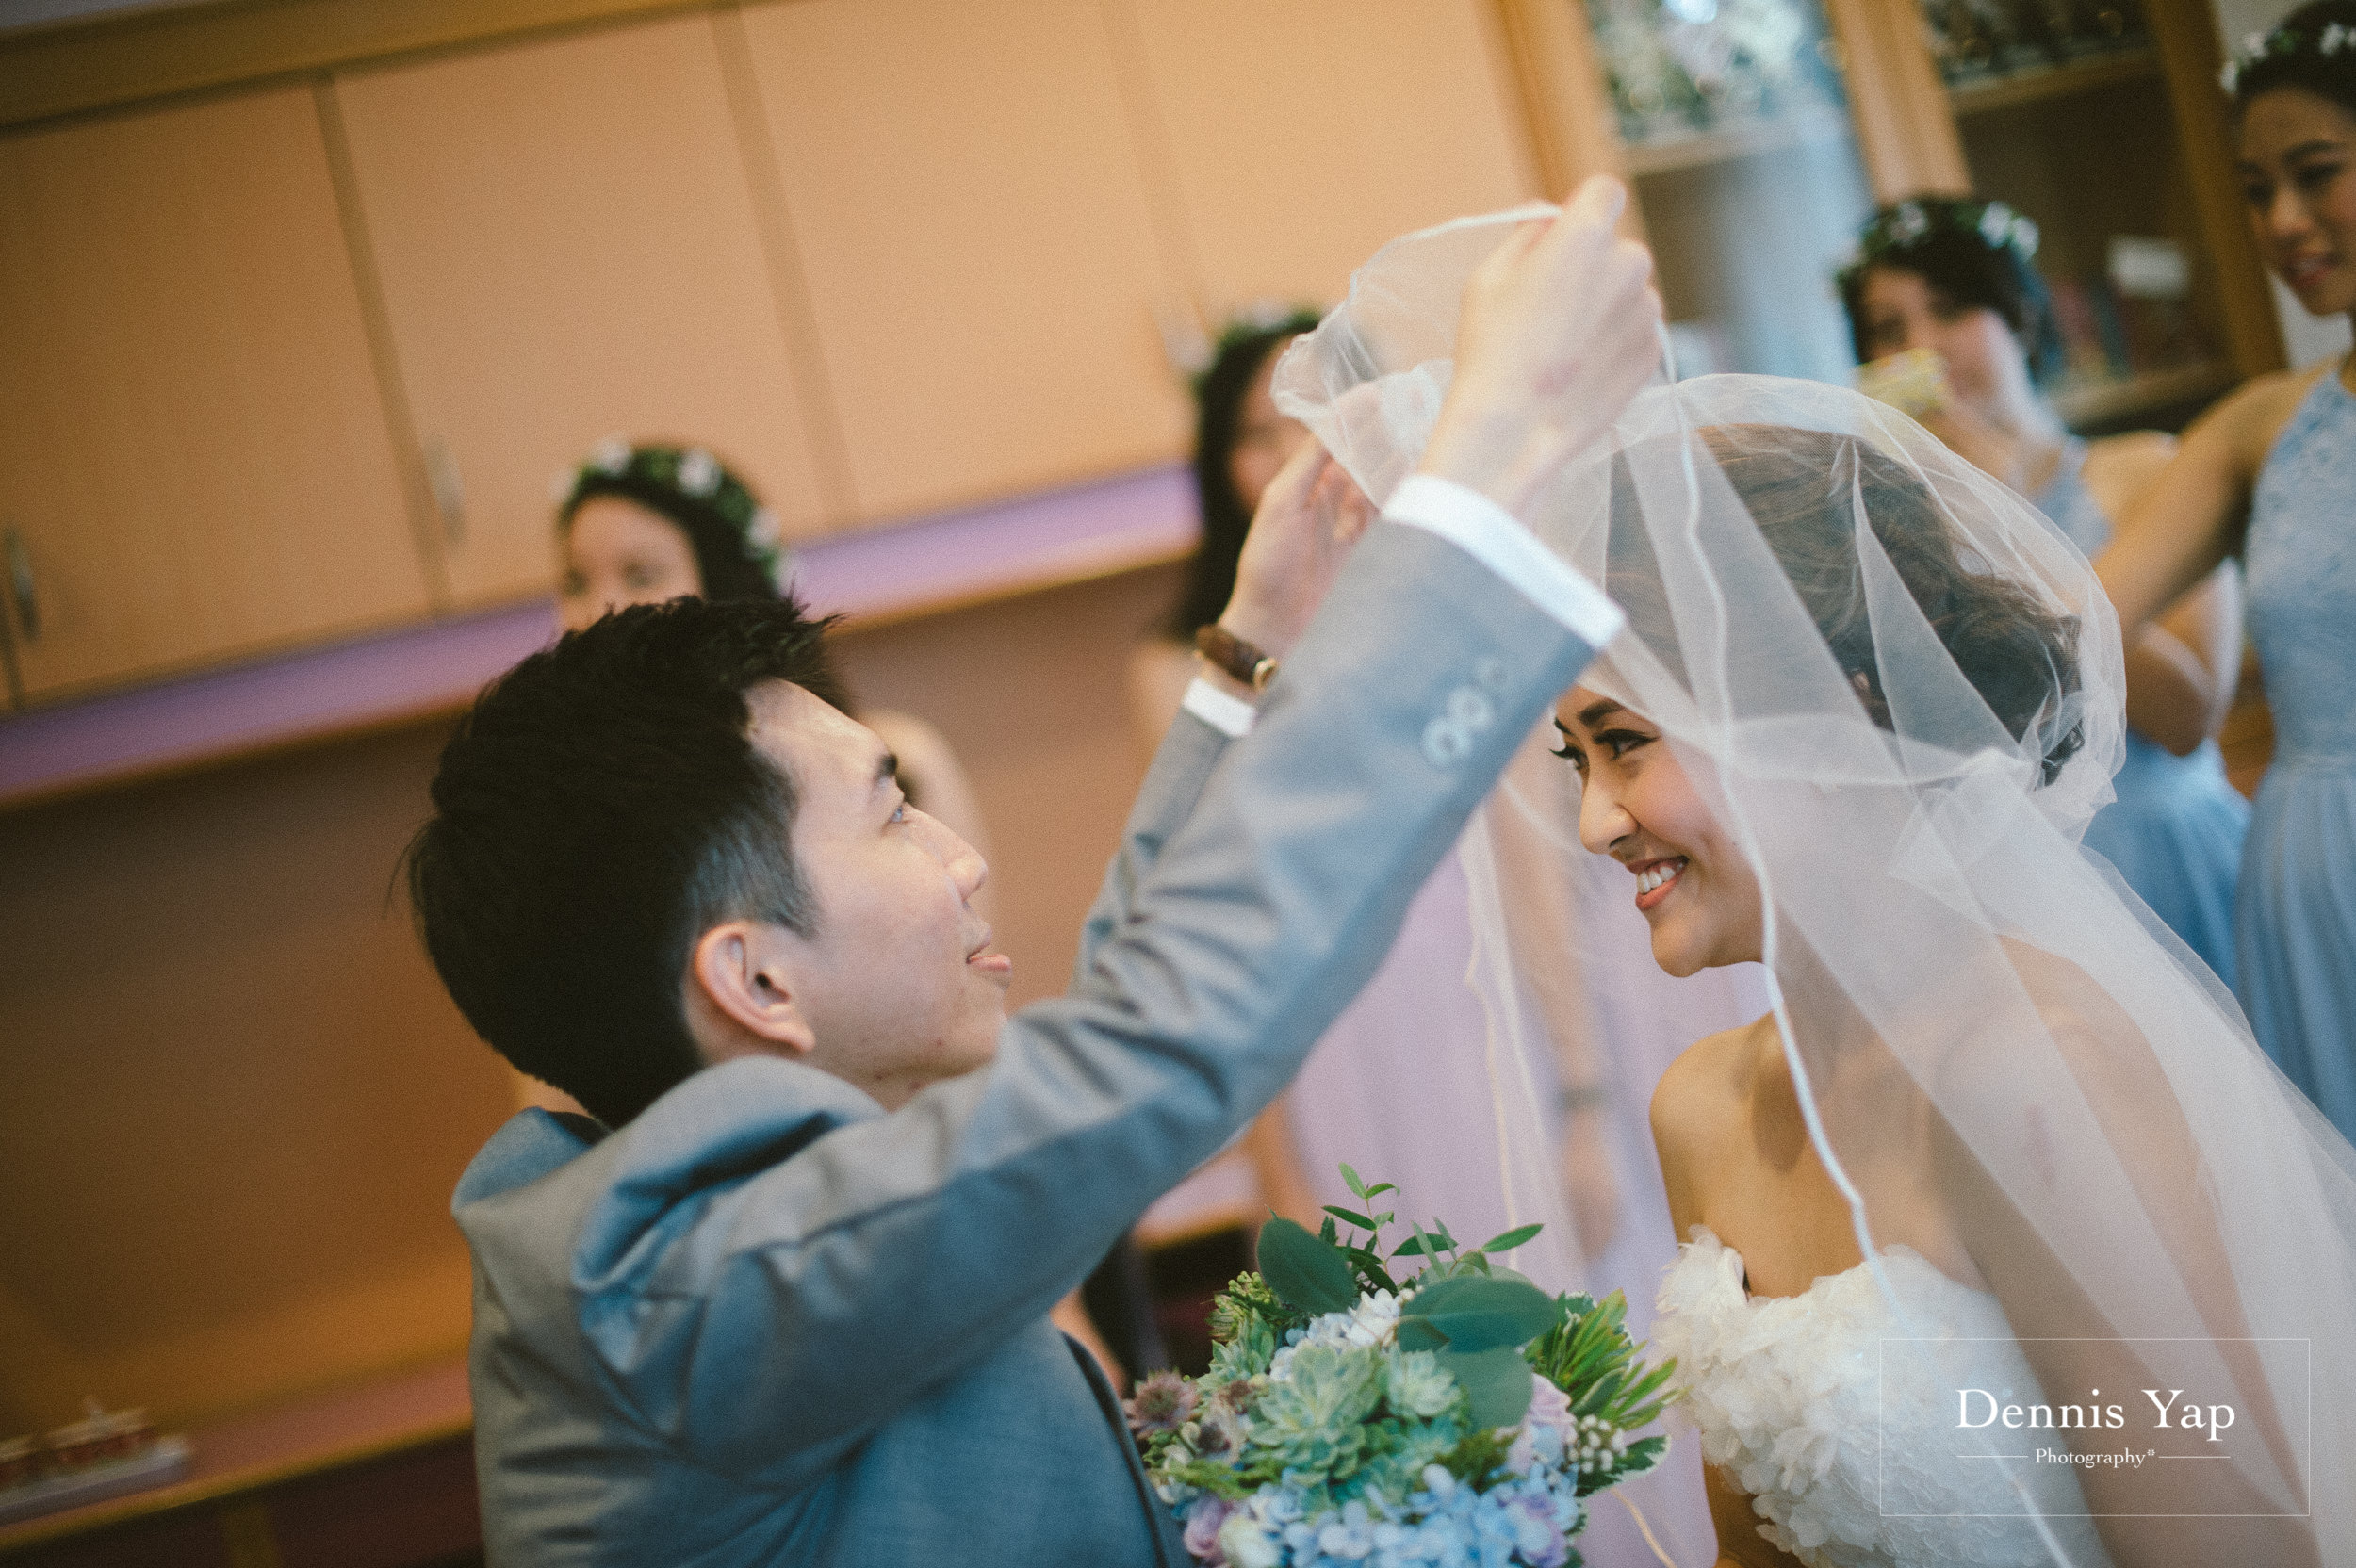 jamie hann wedding day gate crash garden wedding dennis yap photography traditional chinese tea ceremony-14.jpg